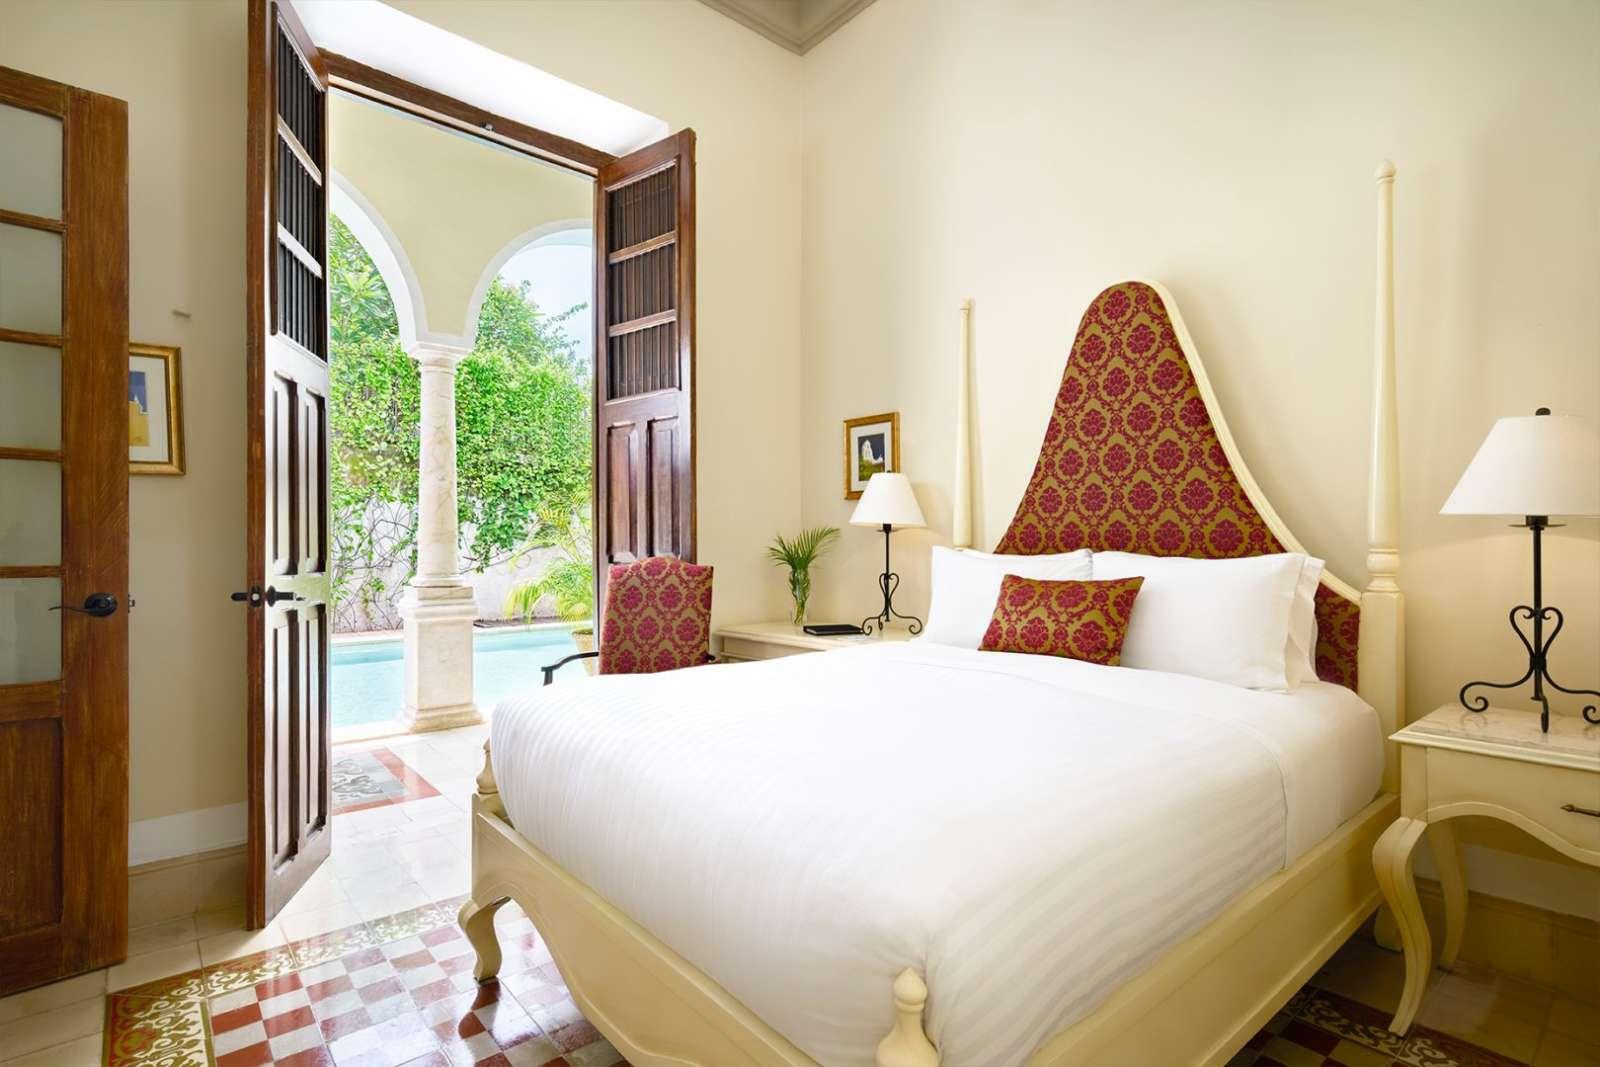 Double bed at Casa Lecanda in Merida